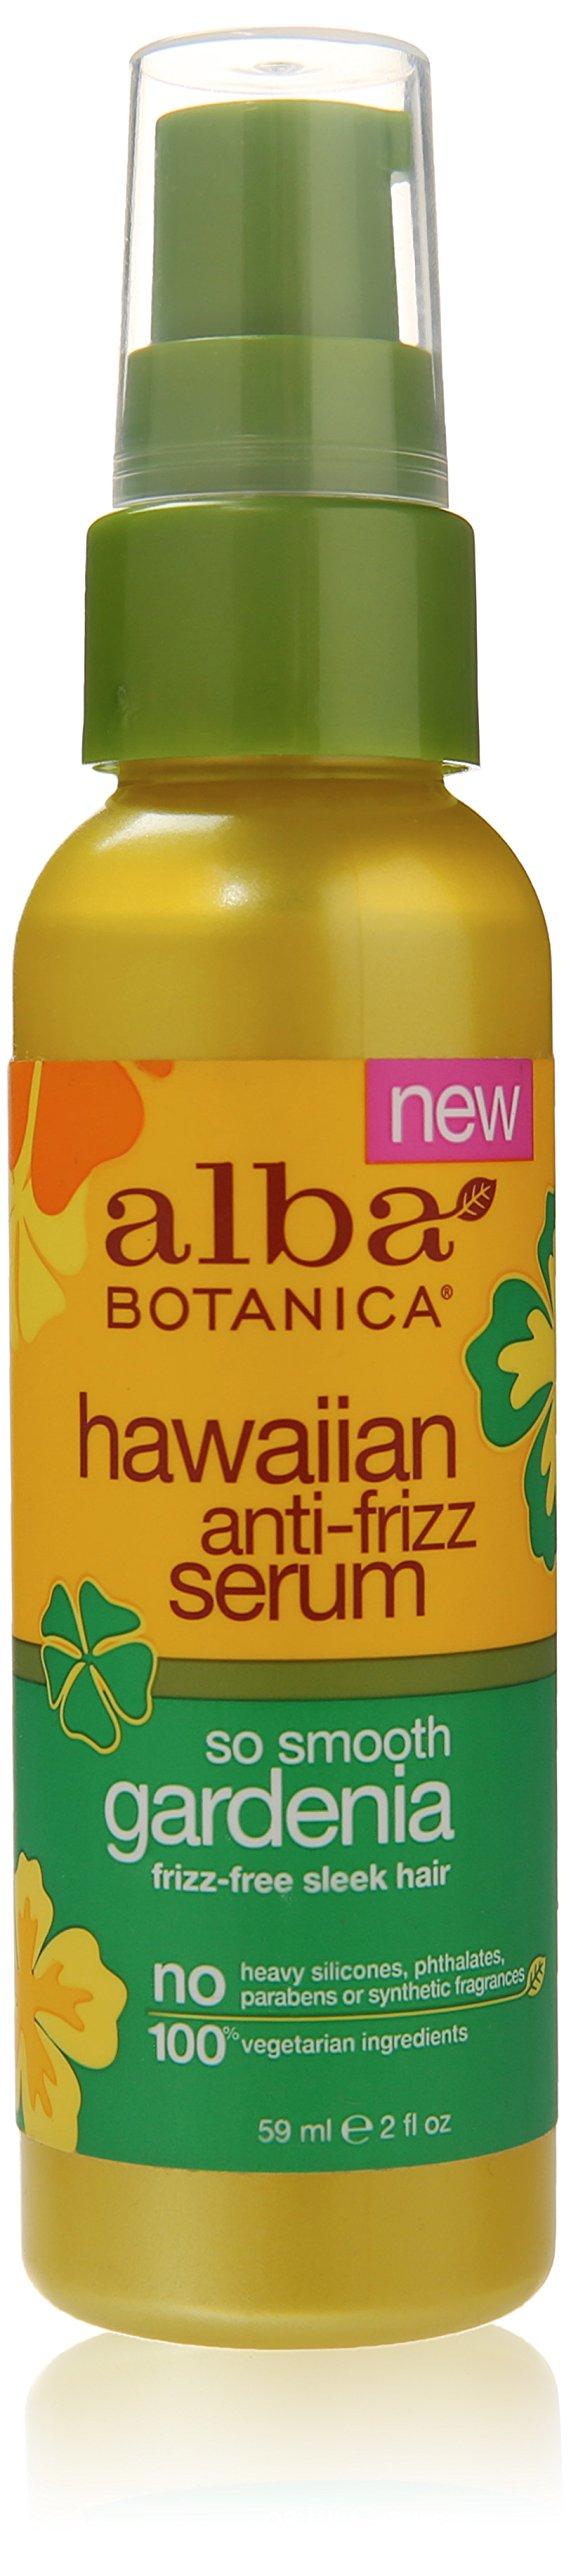 Alba Botanica Hawaiian Gardenia Anti-Frizz Serum, 2 Ounce